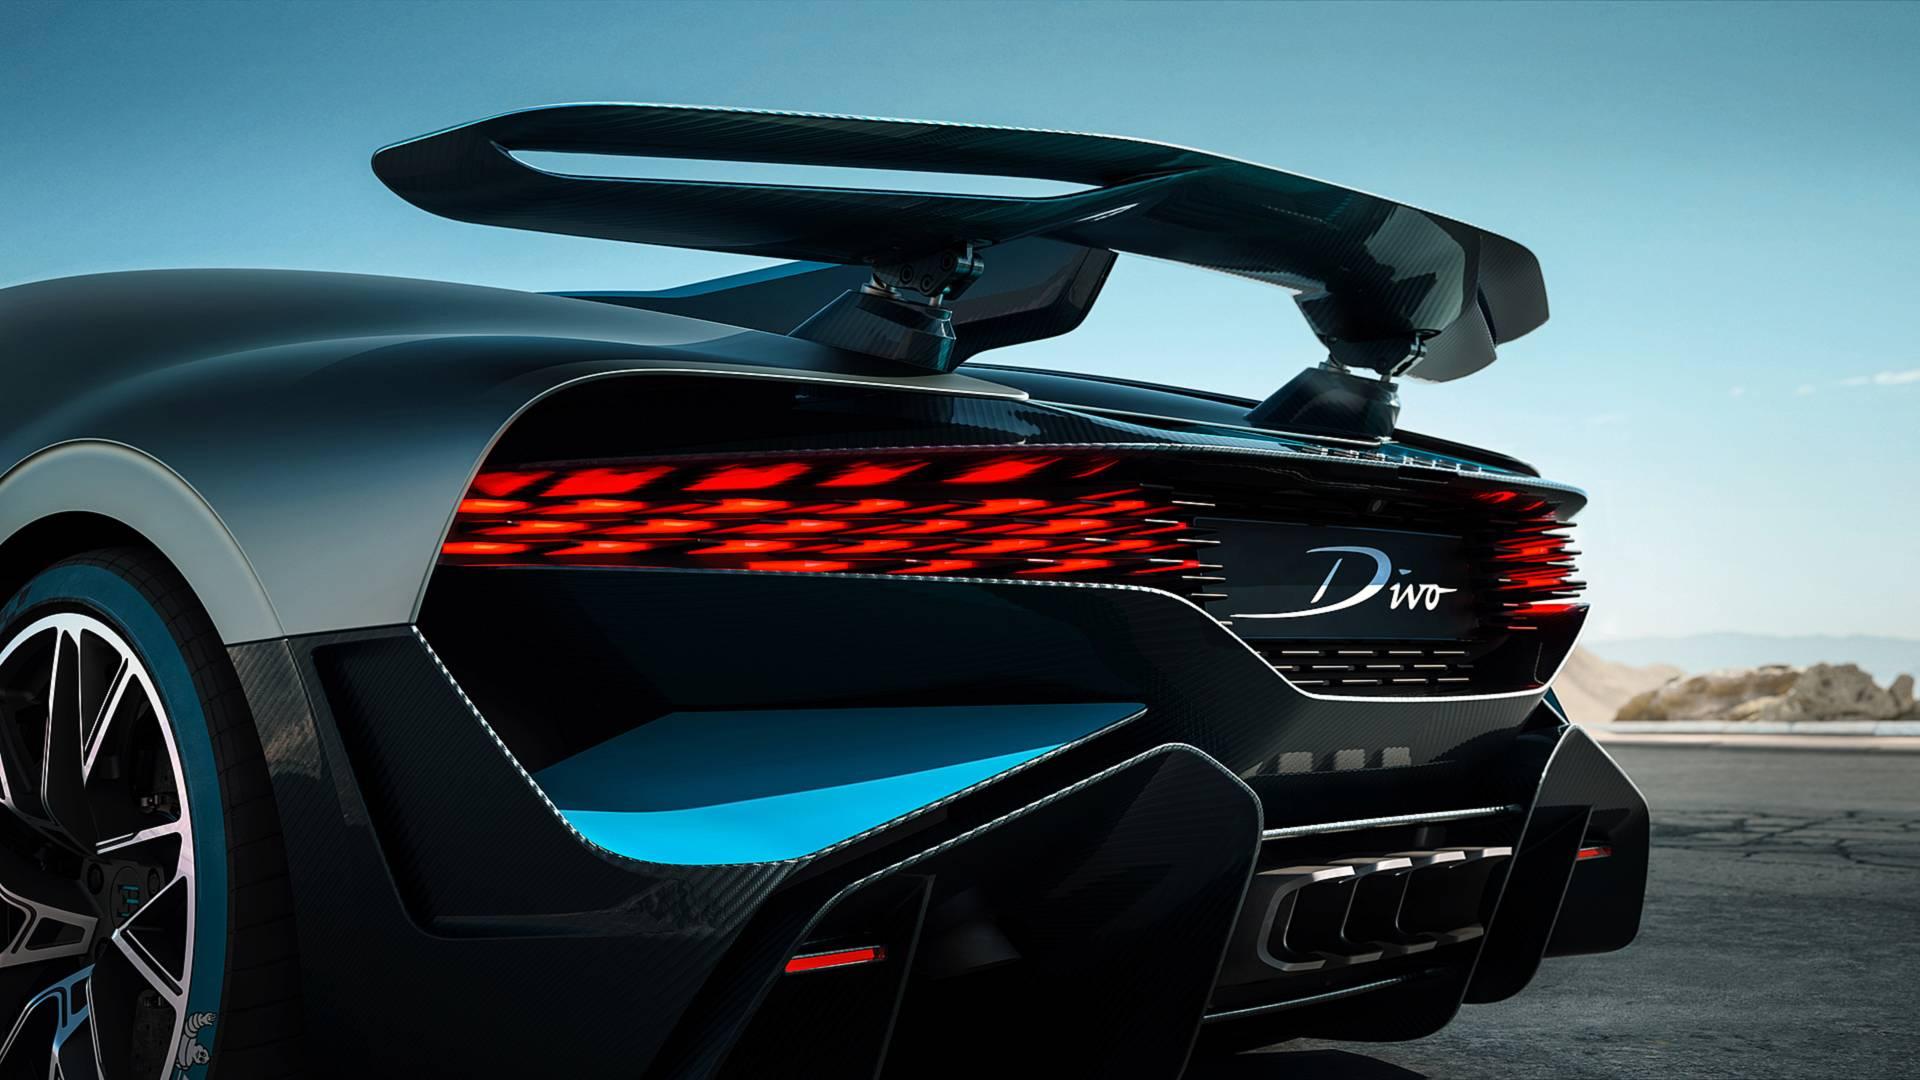 bugatti-divo-4.jpg